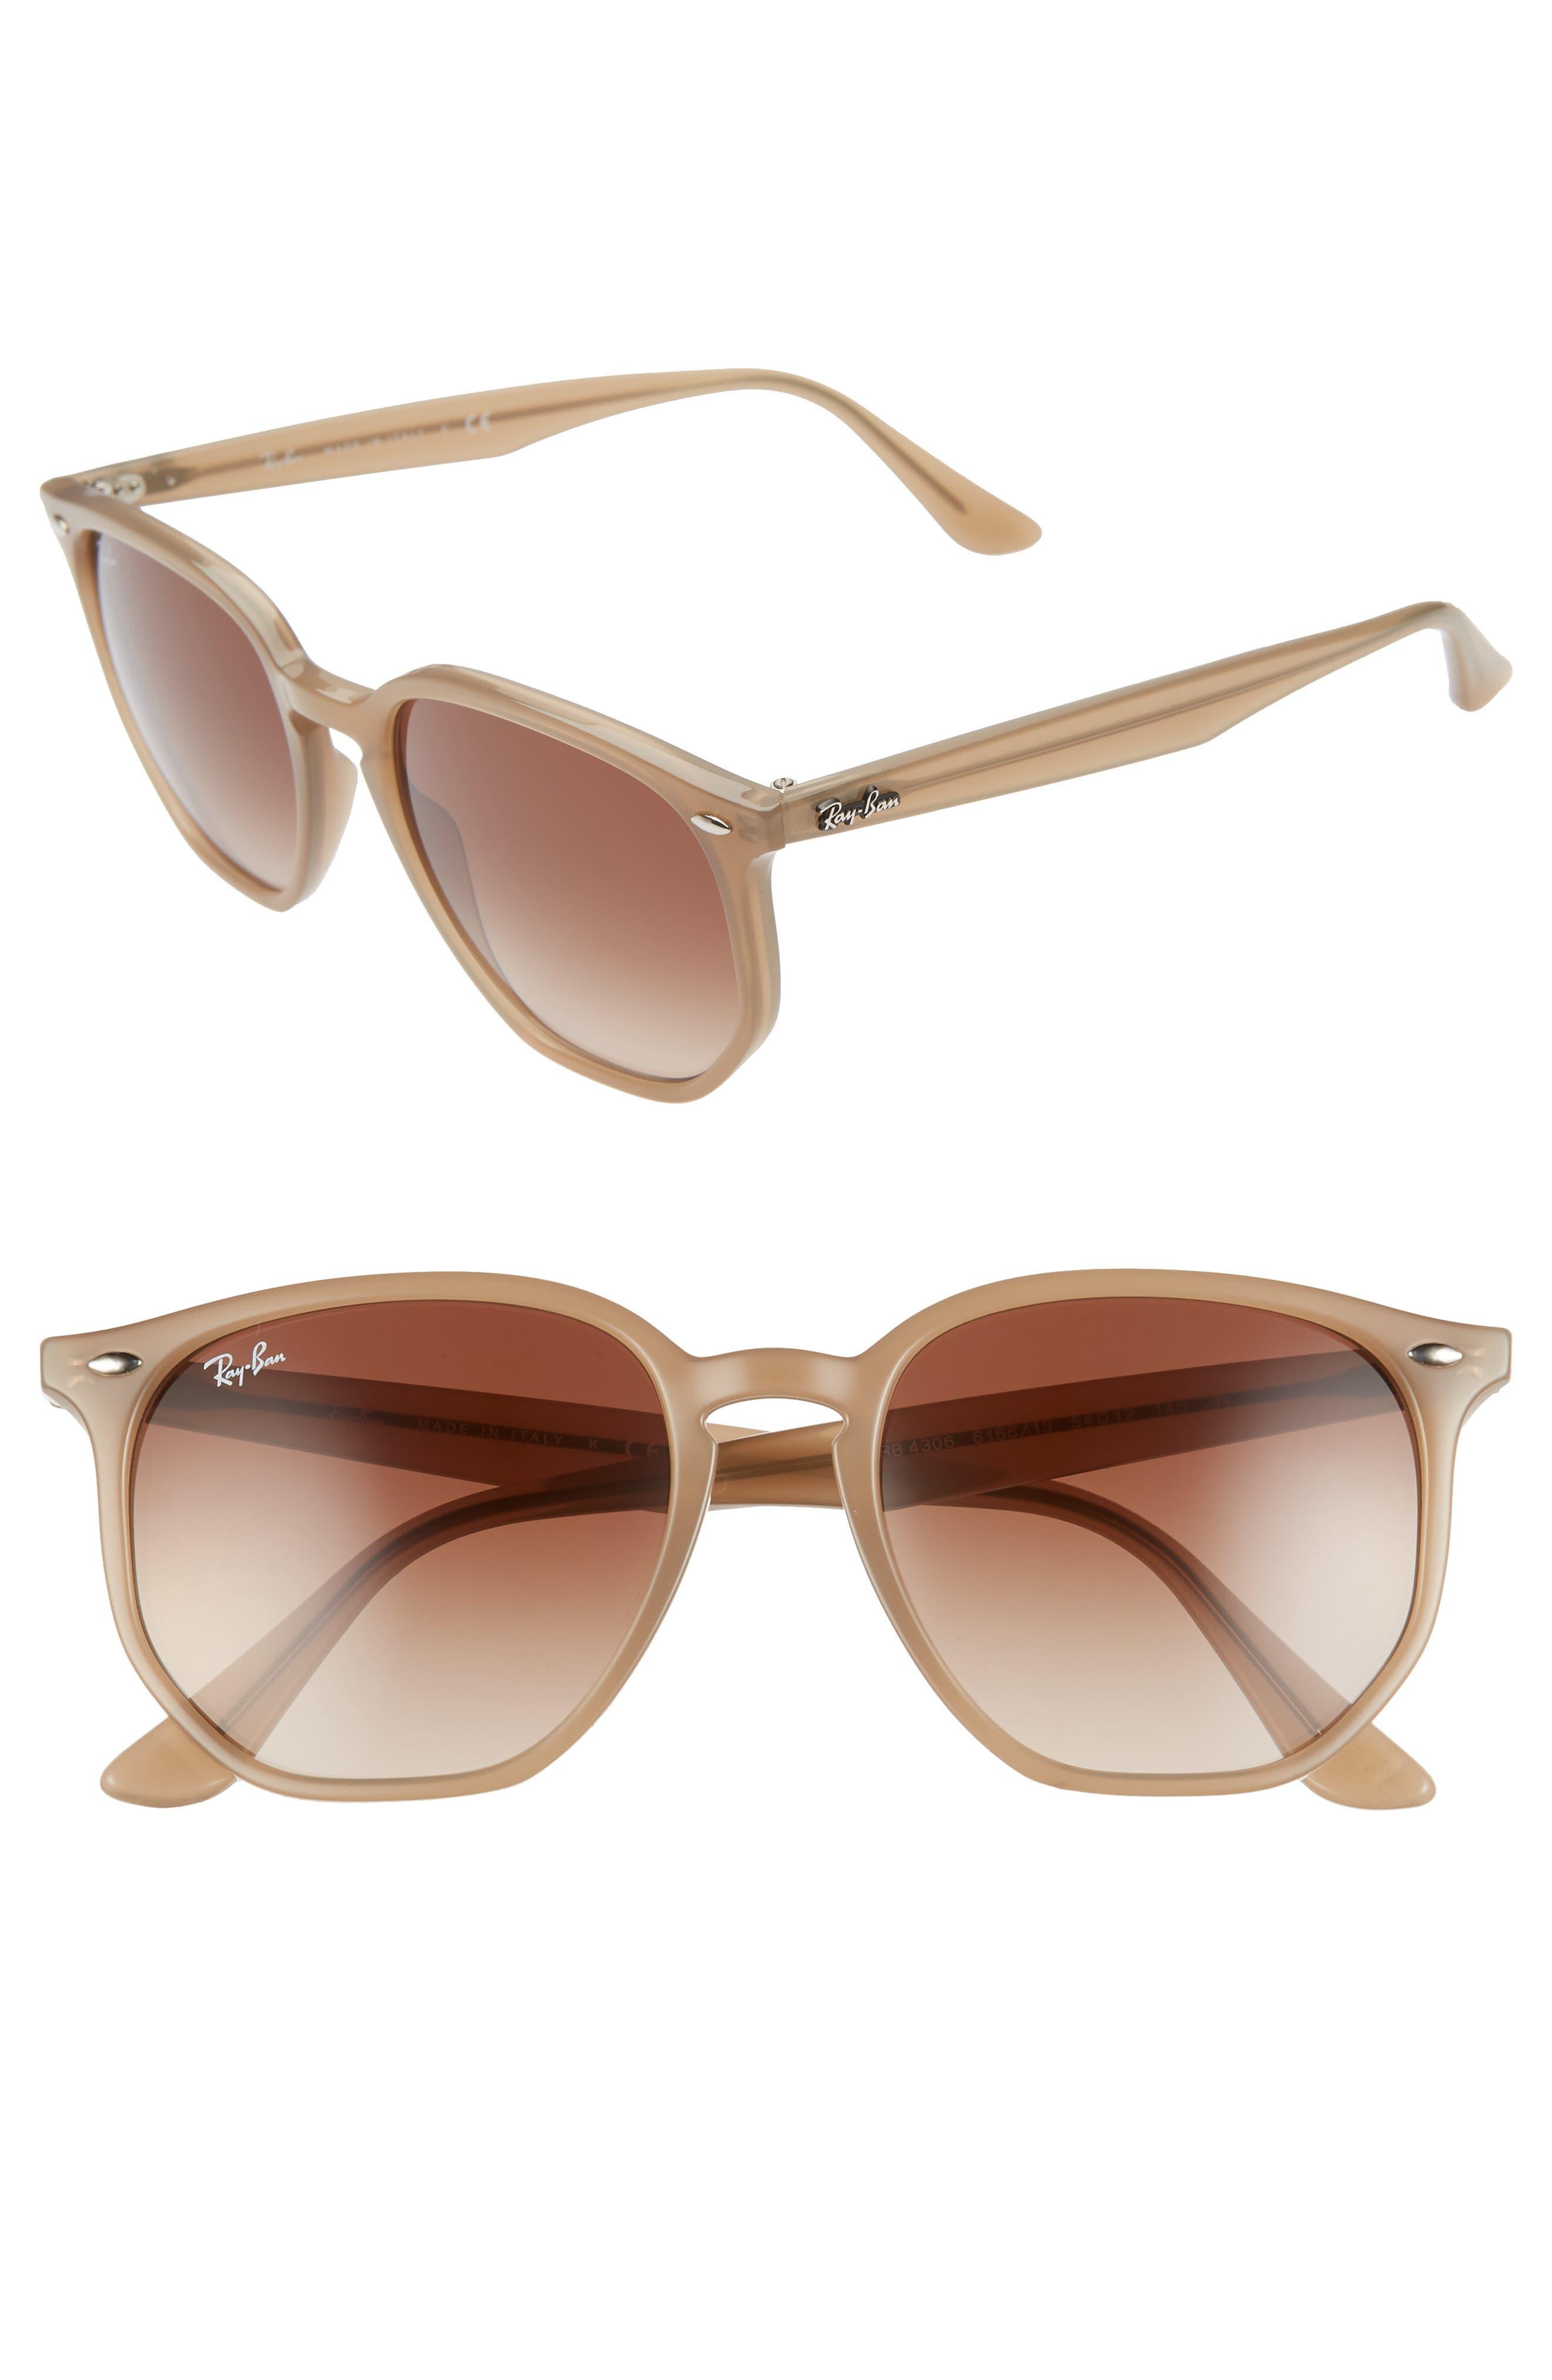 Ray-Ban 5m Gradient Round Sunglasses - Opal Beige/ Brown Gradient